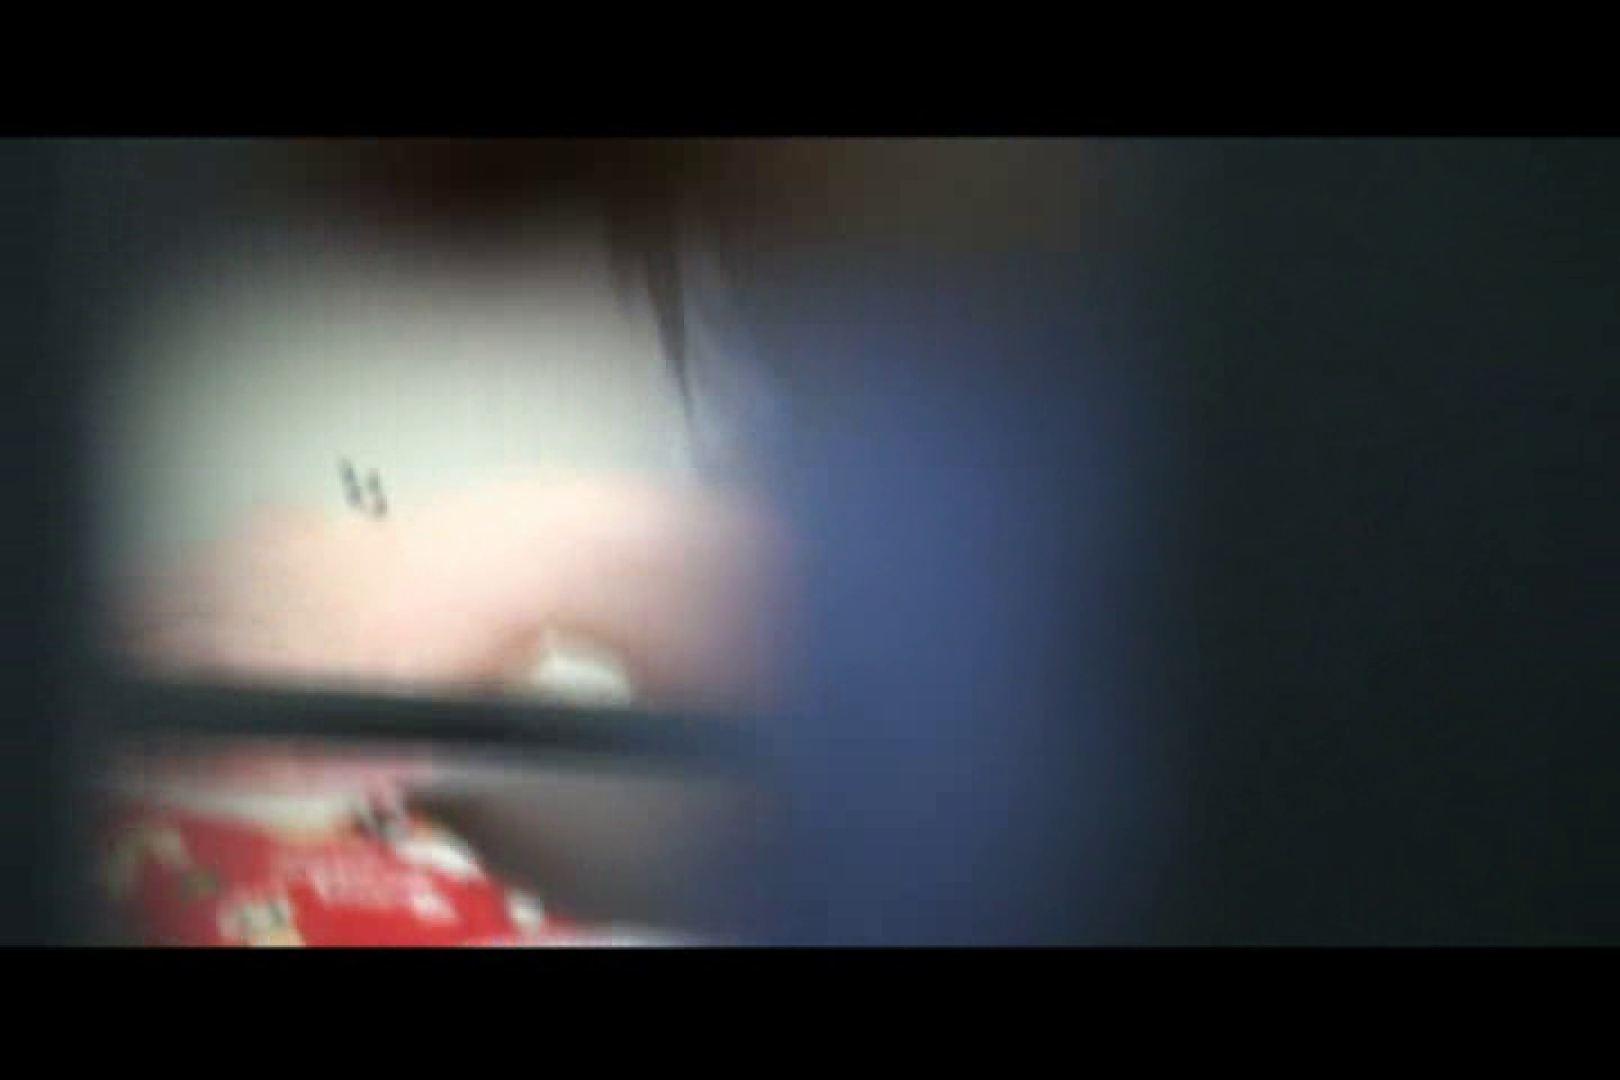 独占配信!無修正! 看護女子寮 vol.12 OLのエロ生活  86連発 64